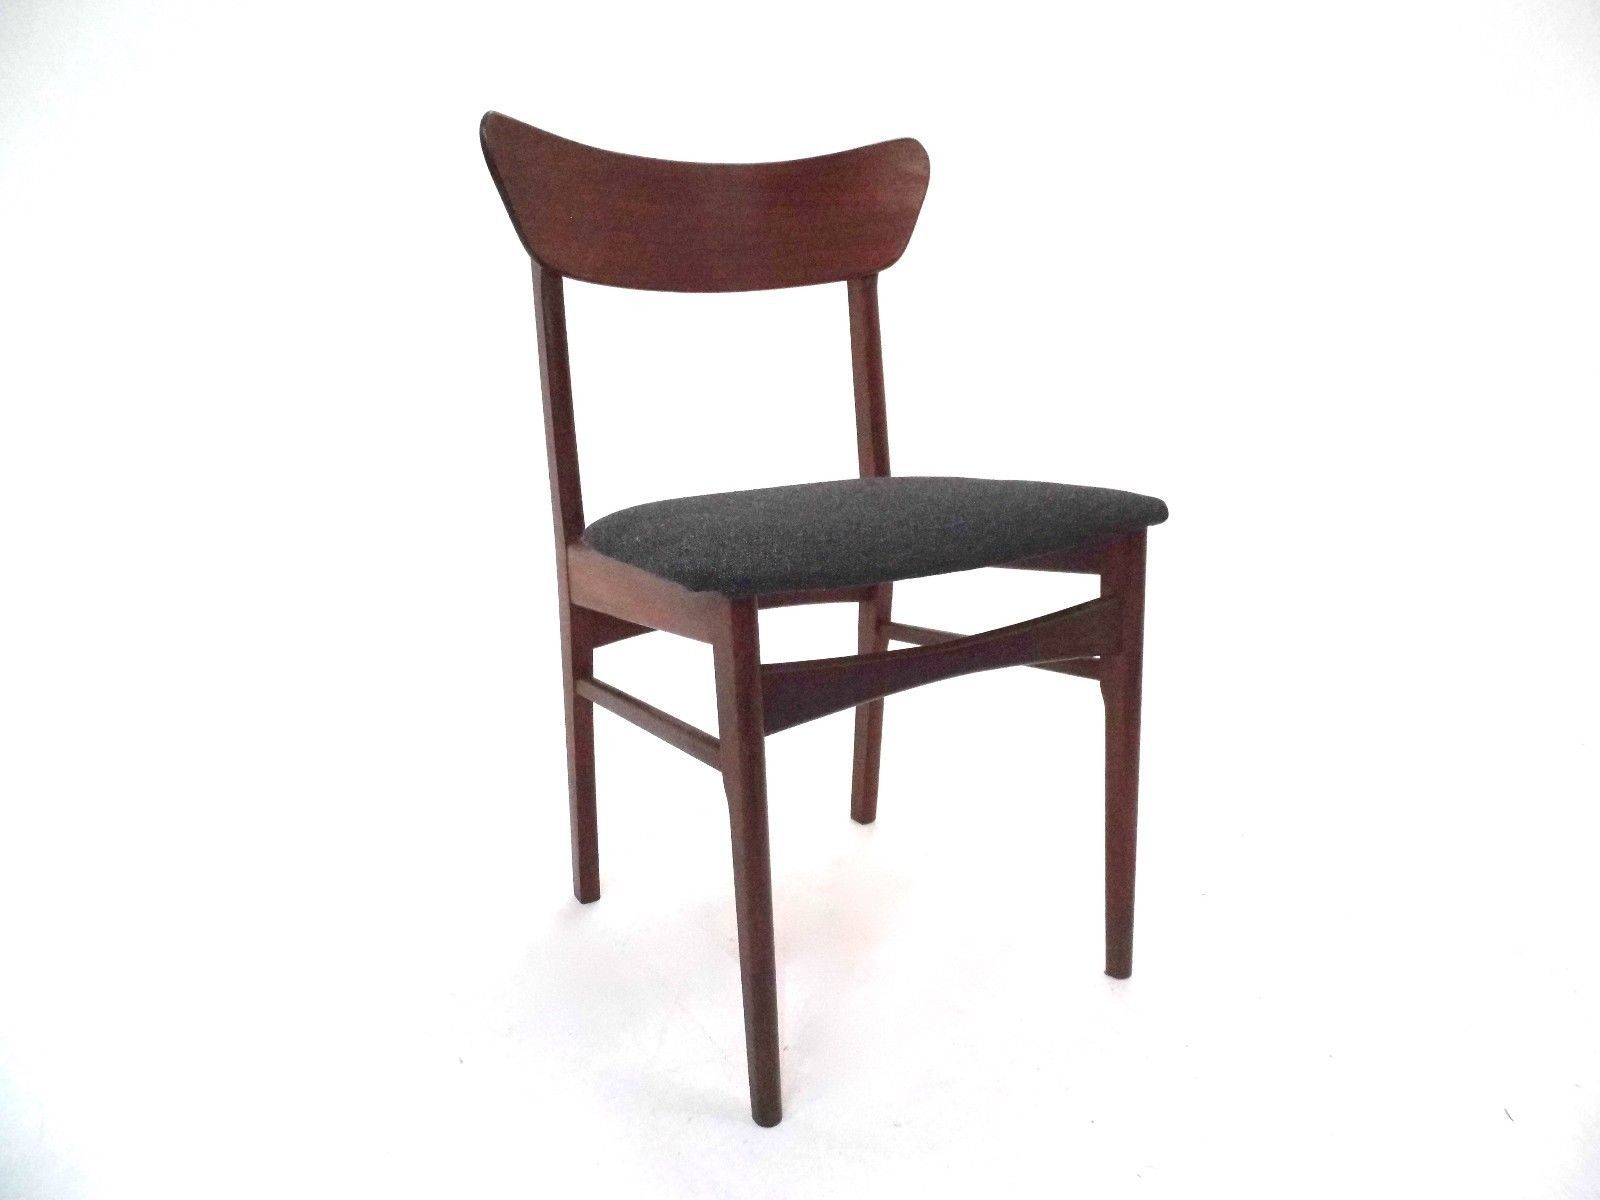 Danish Teak & Charcoal Grey Fabric Dining Chairs 1960s Set of 4